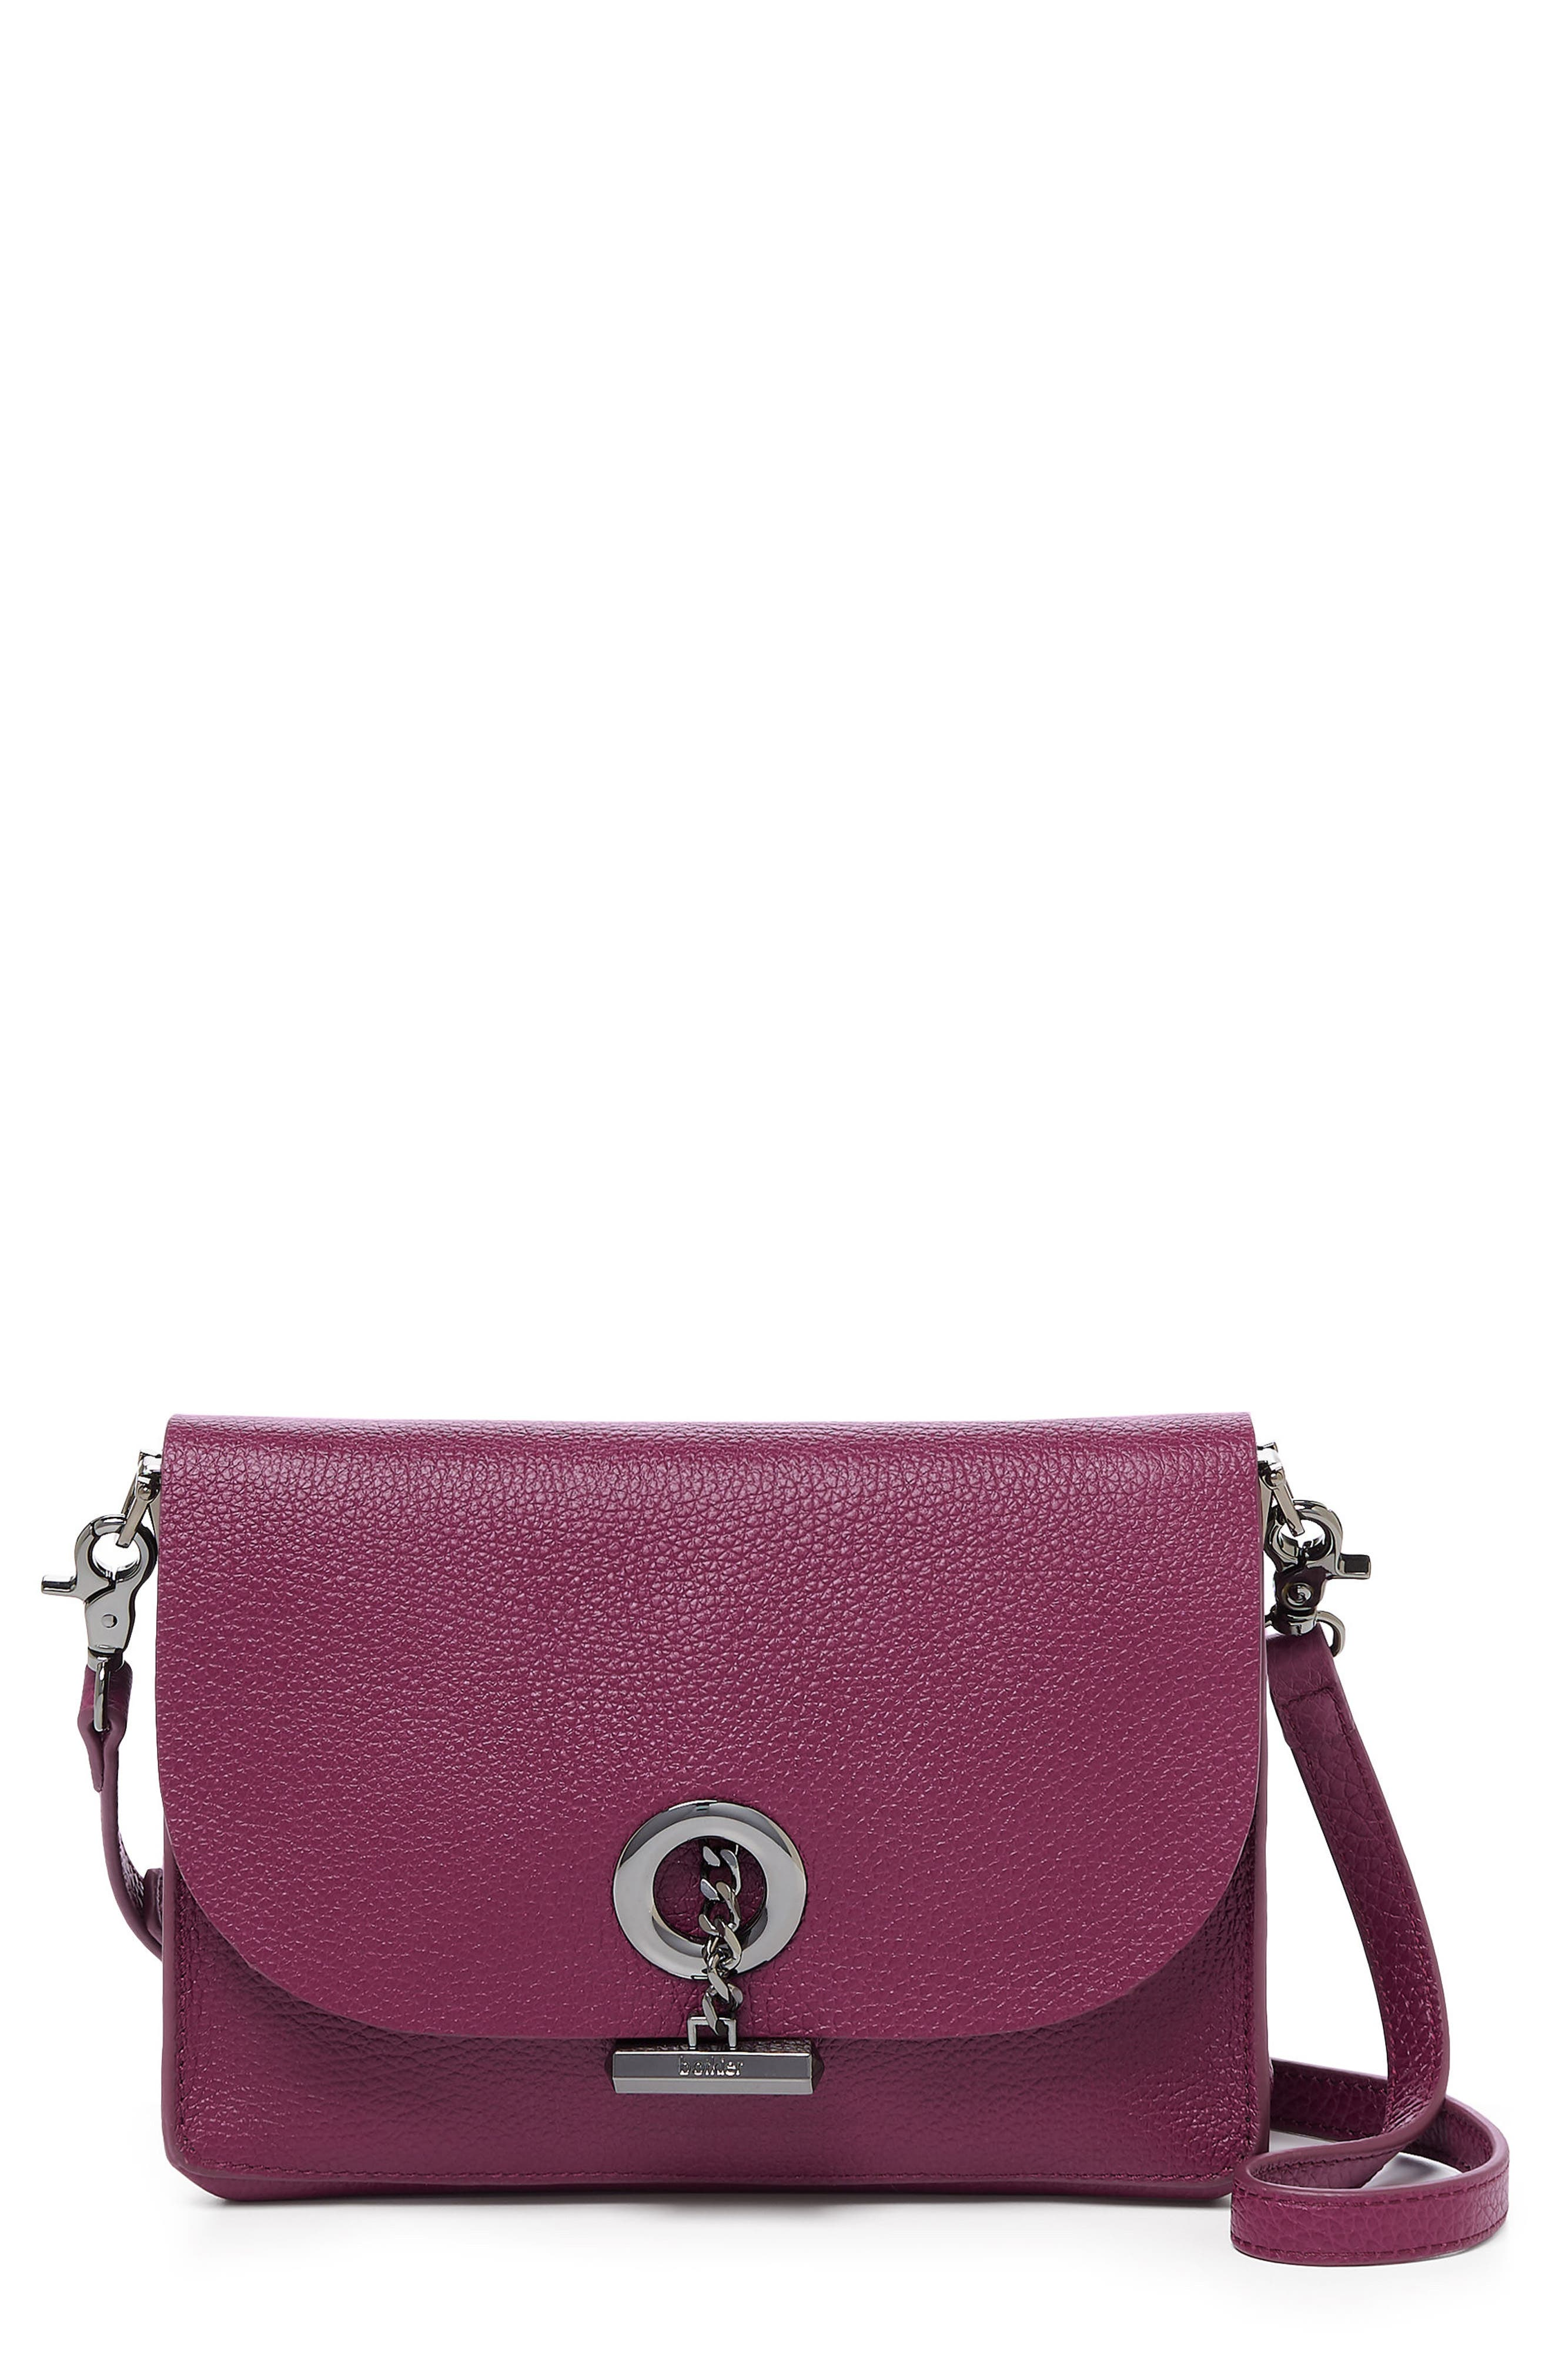 Waverly Leather Crossbody Bag,                             Main thumbnail 6, color,